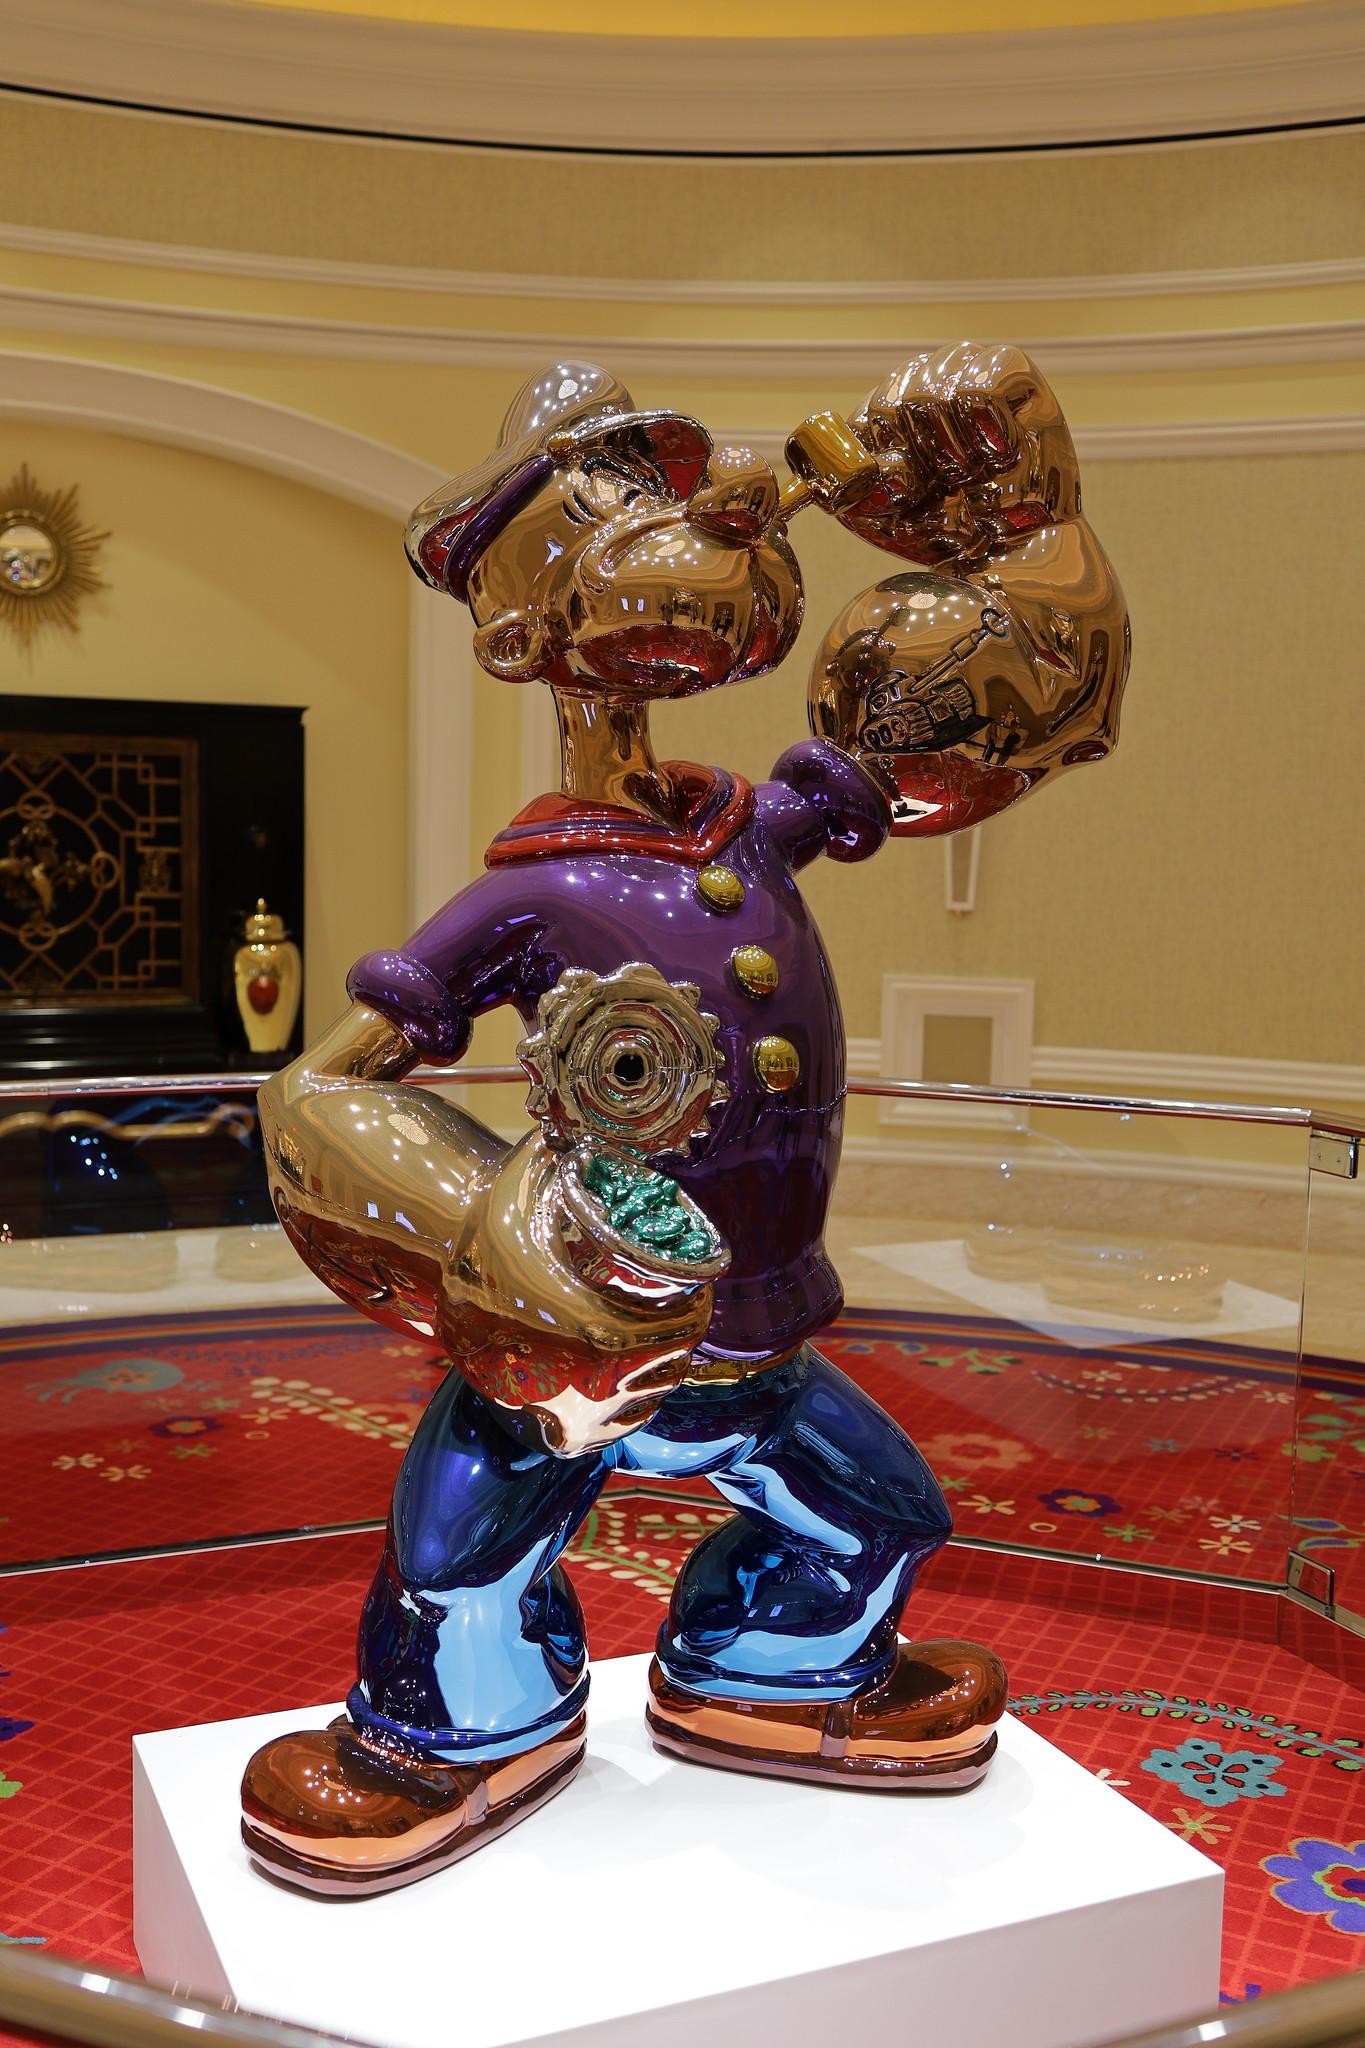 Popeye sculpture by Jeff Koons